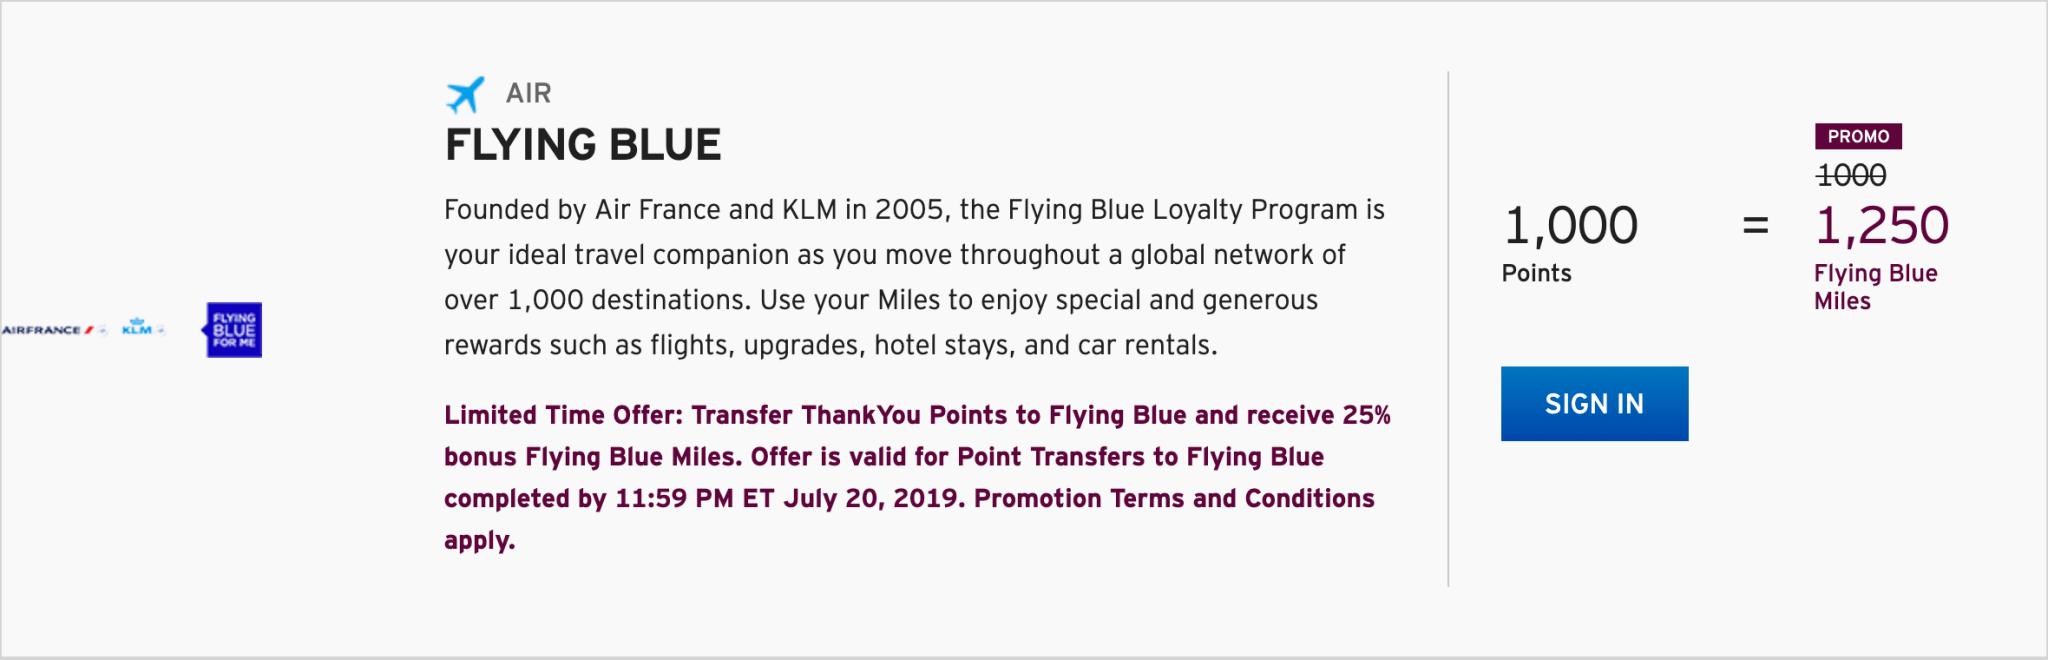 Receive a 25% bonus through July 20th when you transfer Citi ThankYou points to Air France FlyingBlue. (Image via Citi)